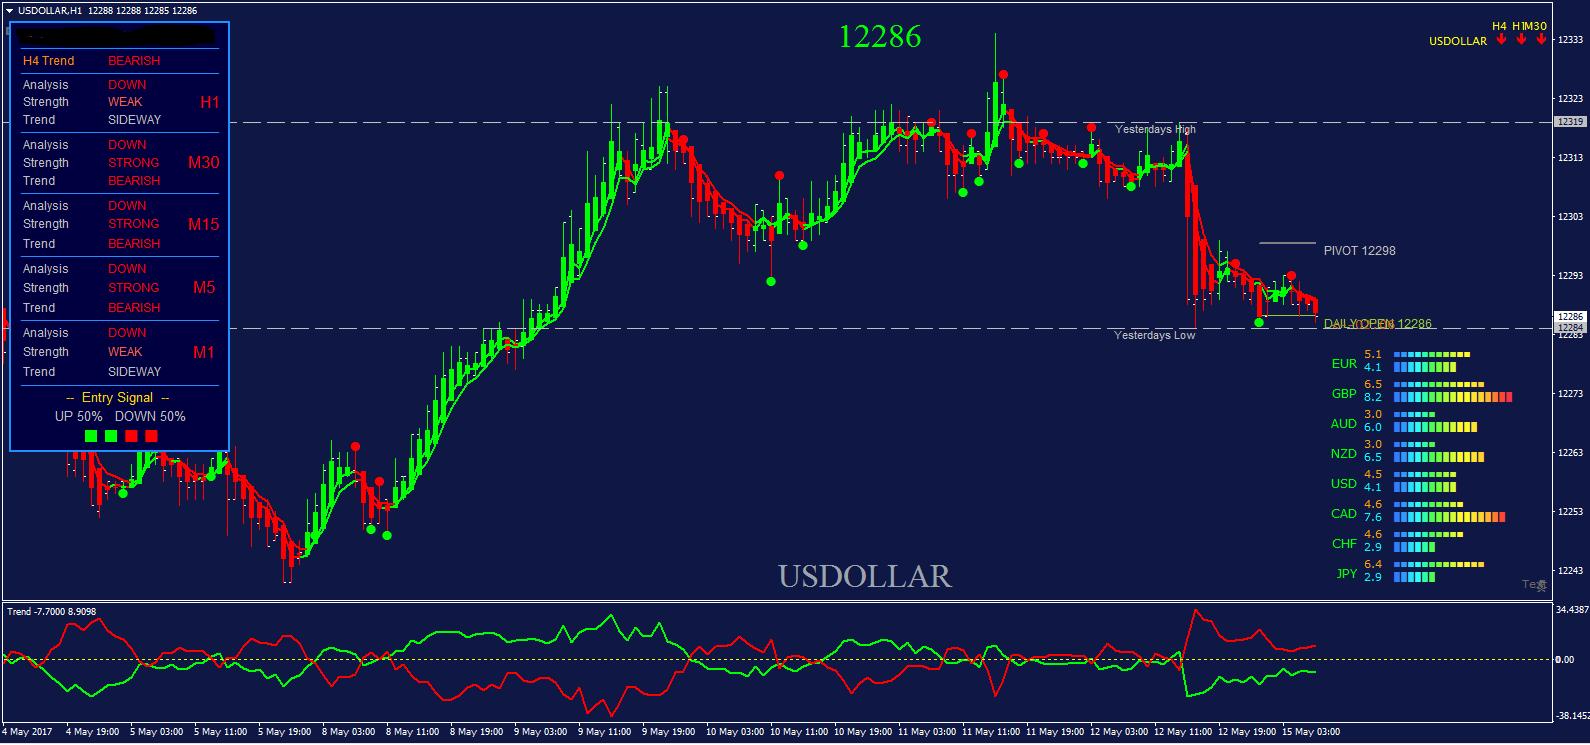 Us dollar index forex trading